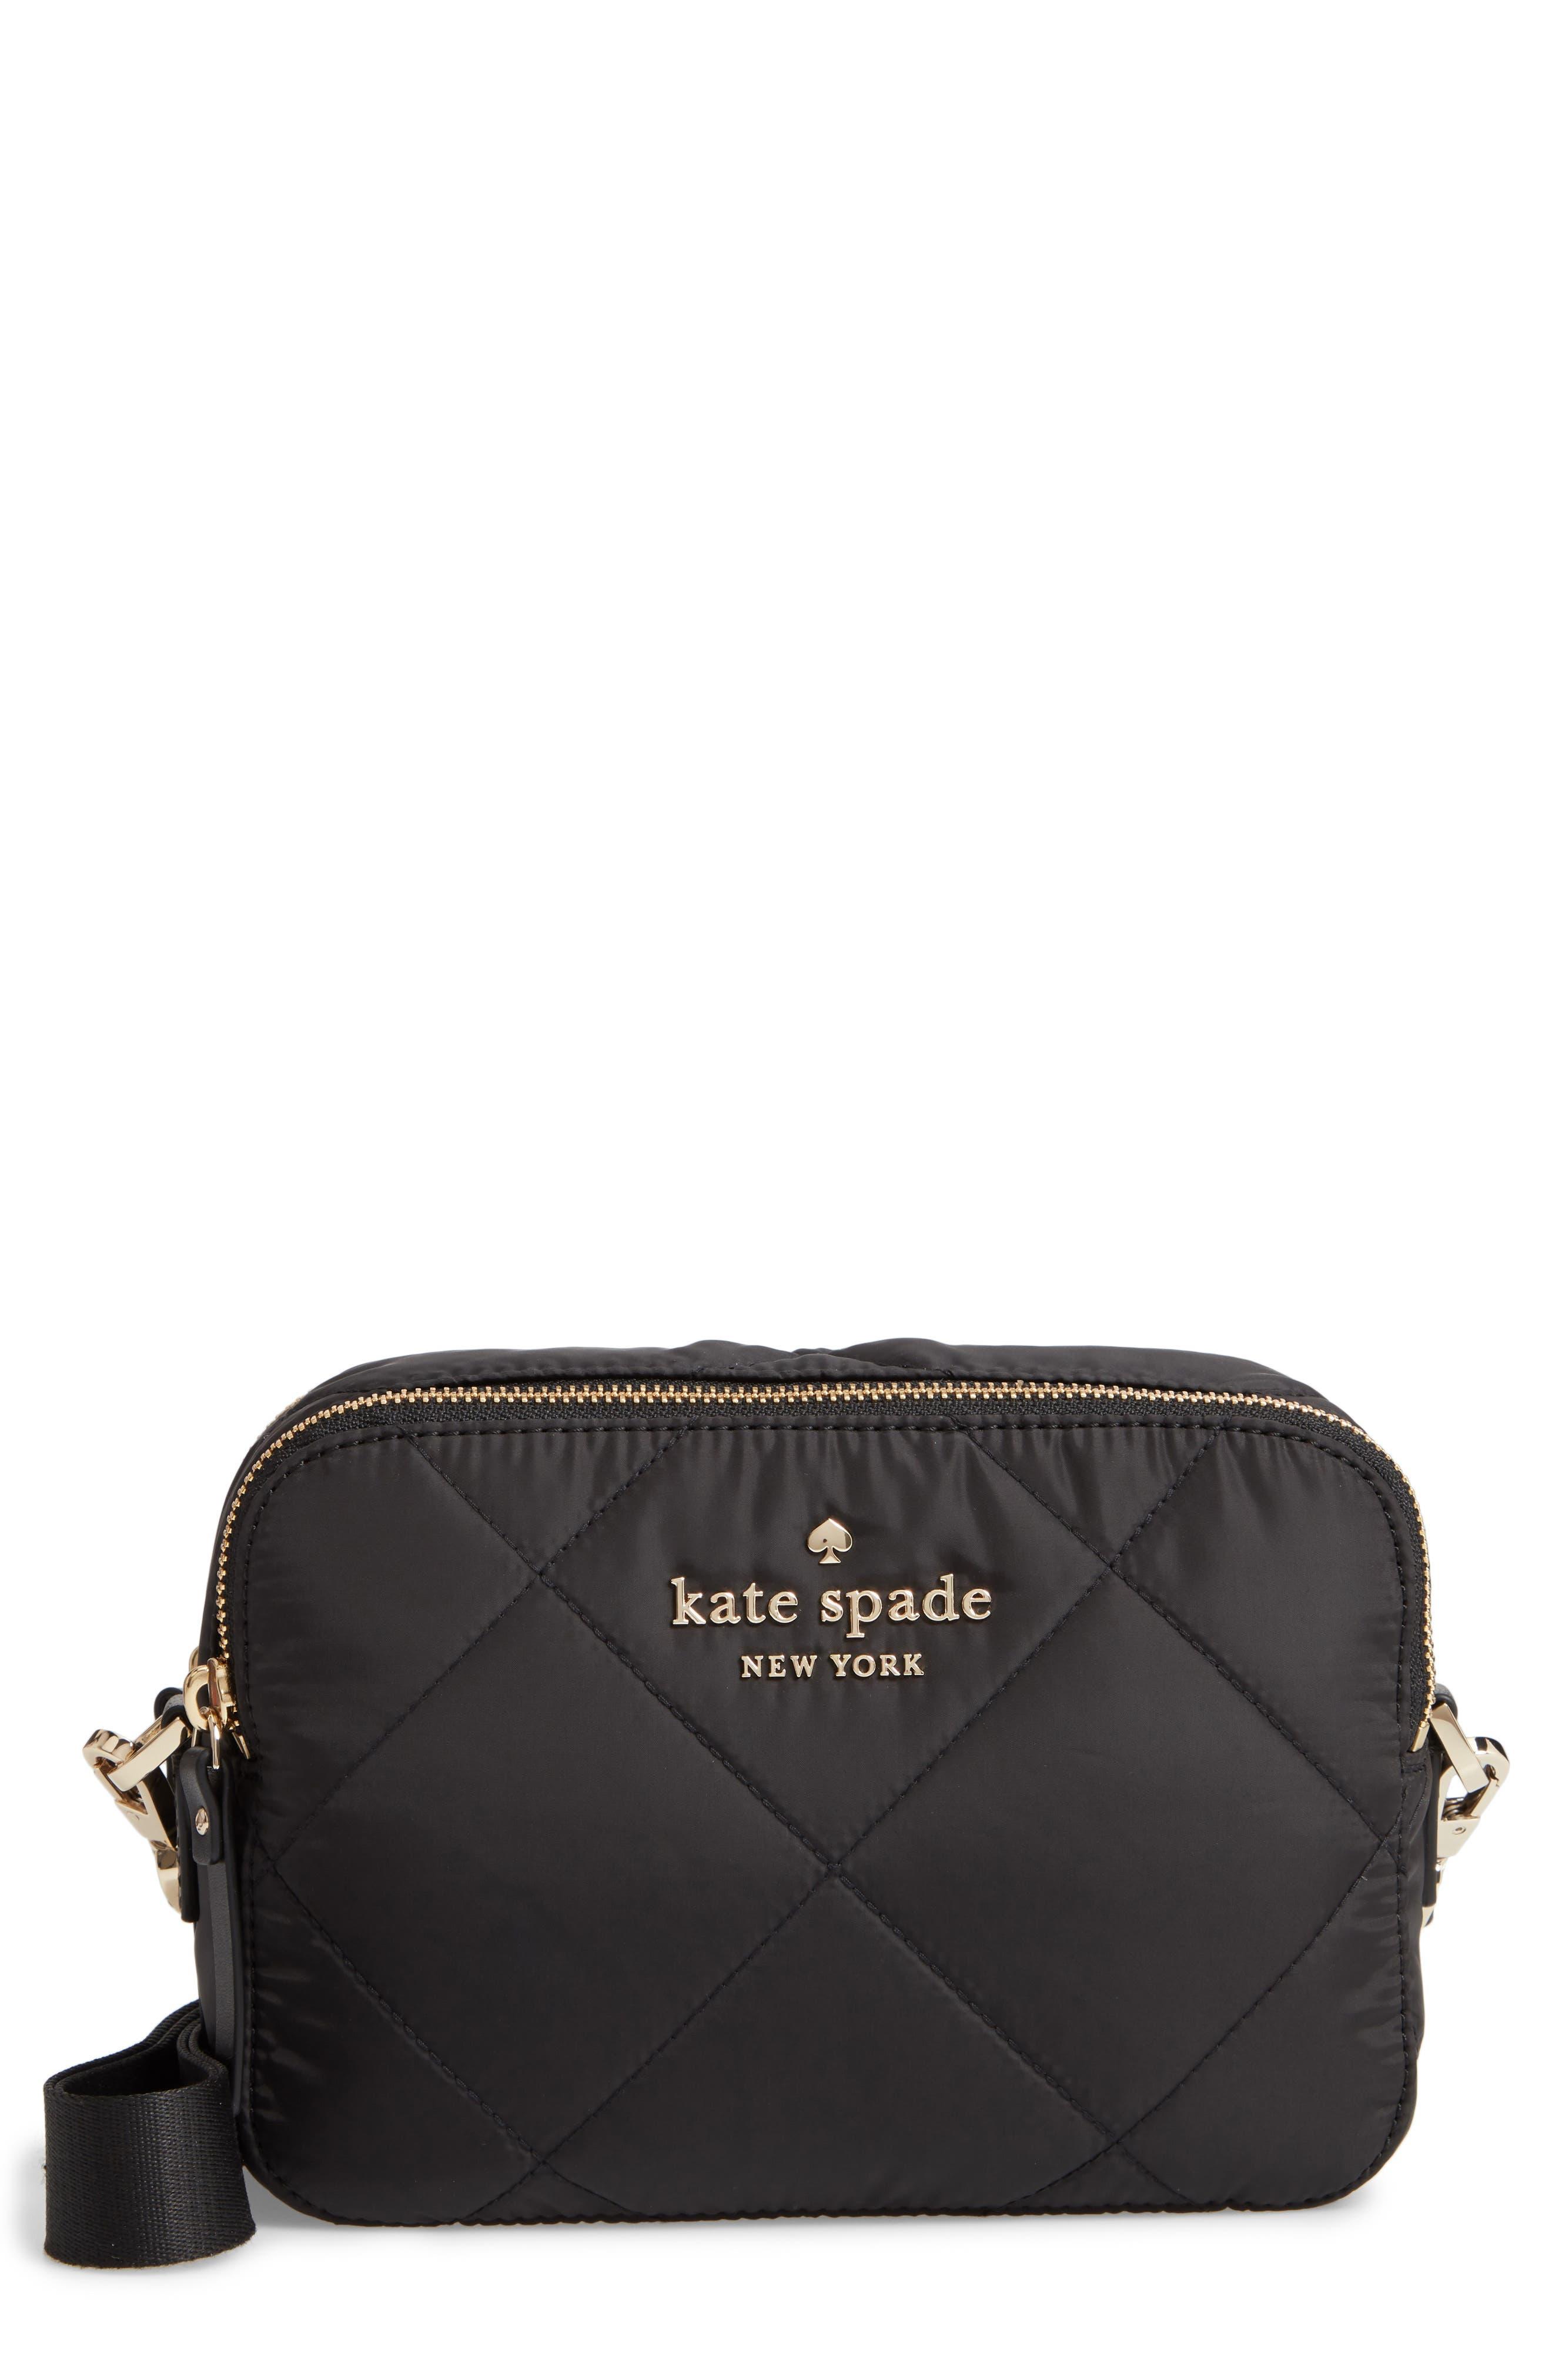 Kate Spade Quilted Handbags Nordstrom